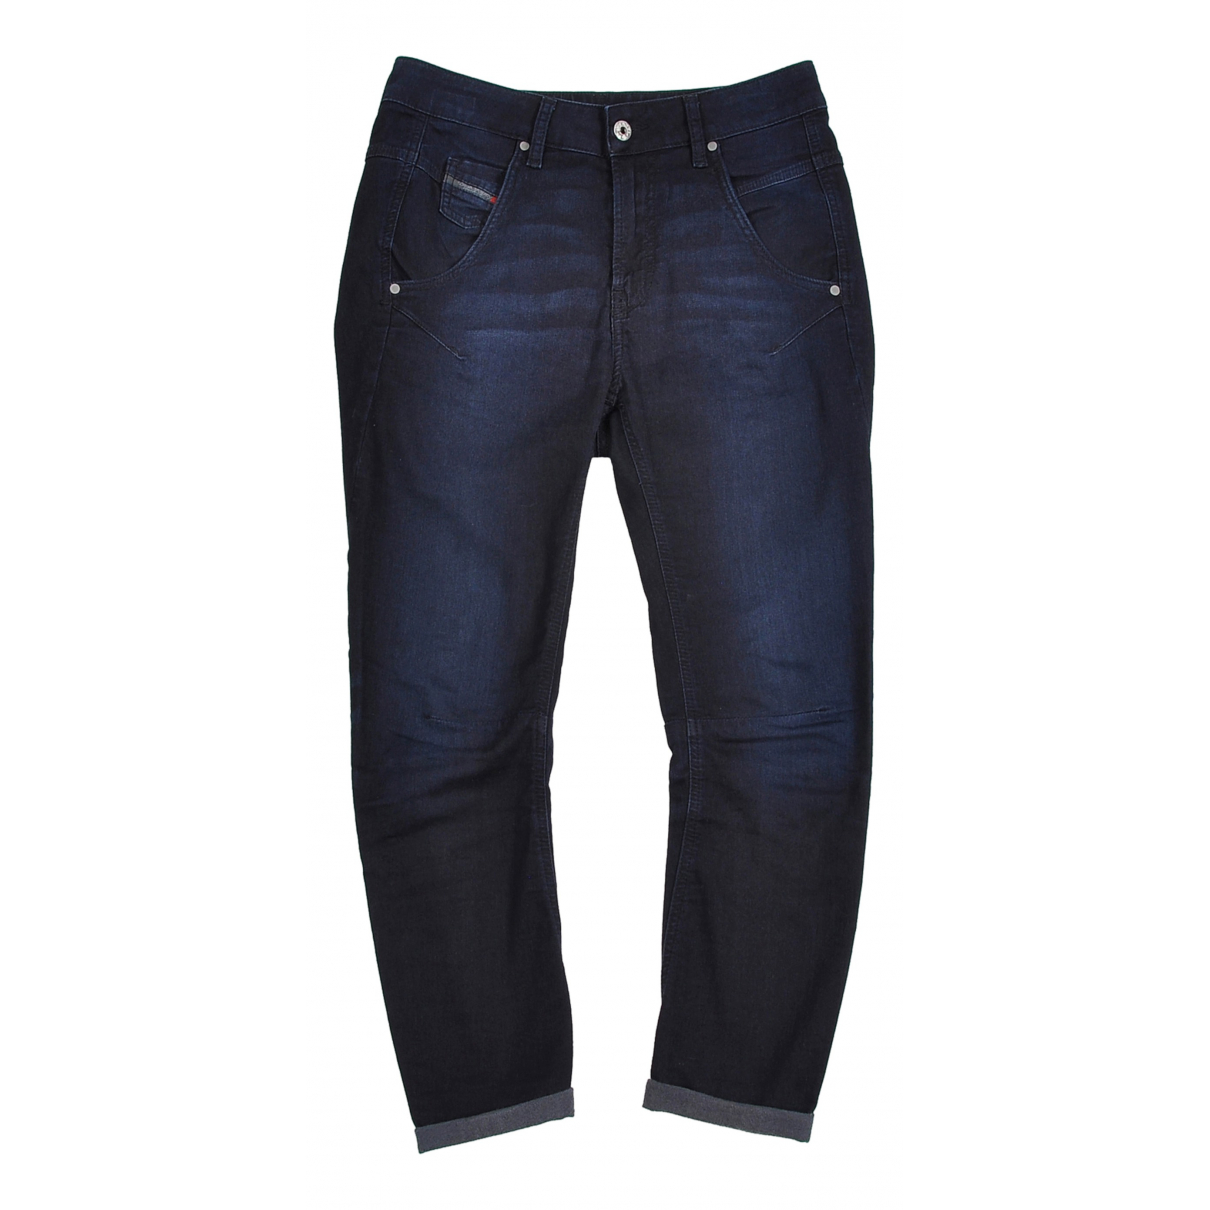 Diesel \N Navy Cotton - elasthane Jeans for Women 25 US